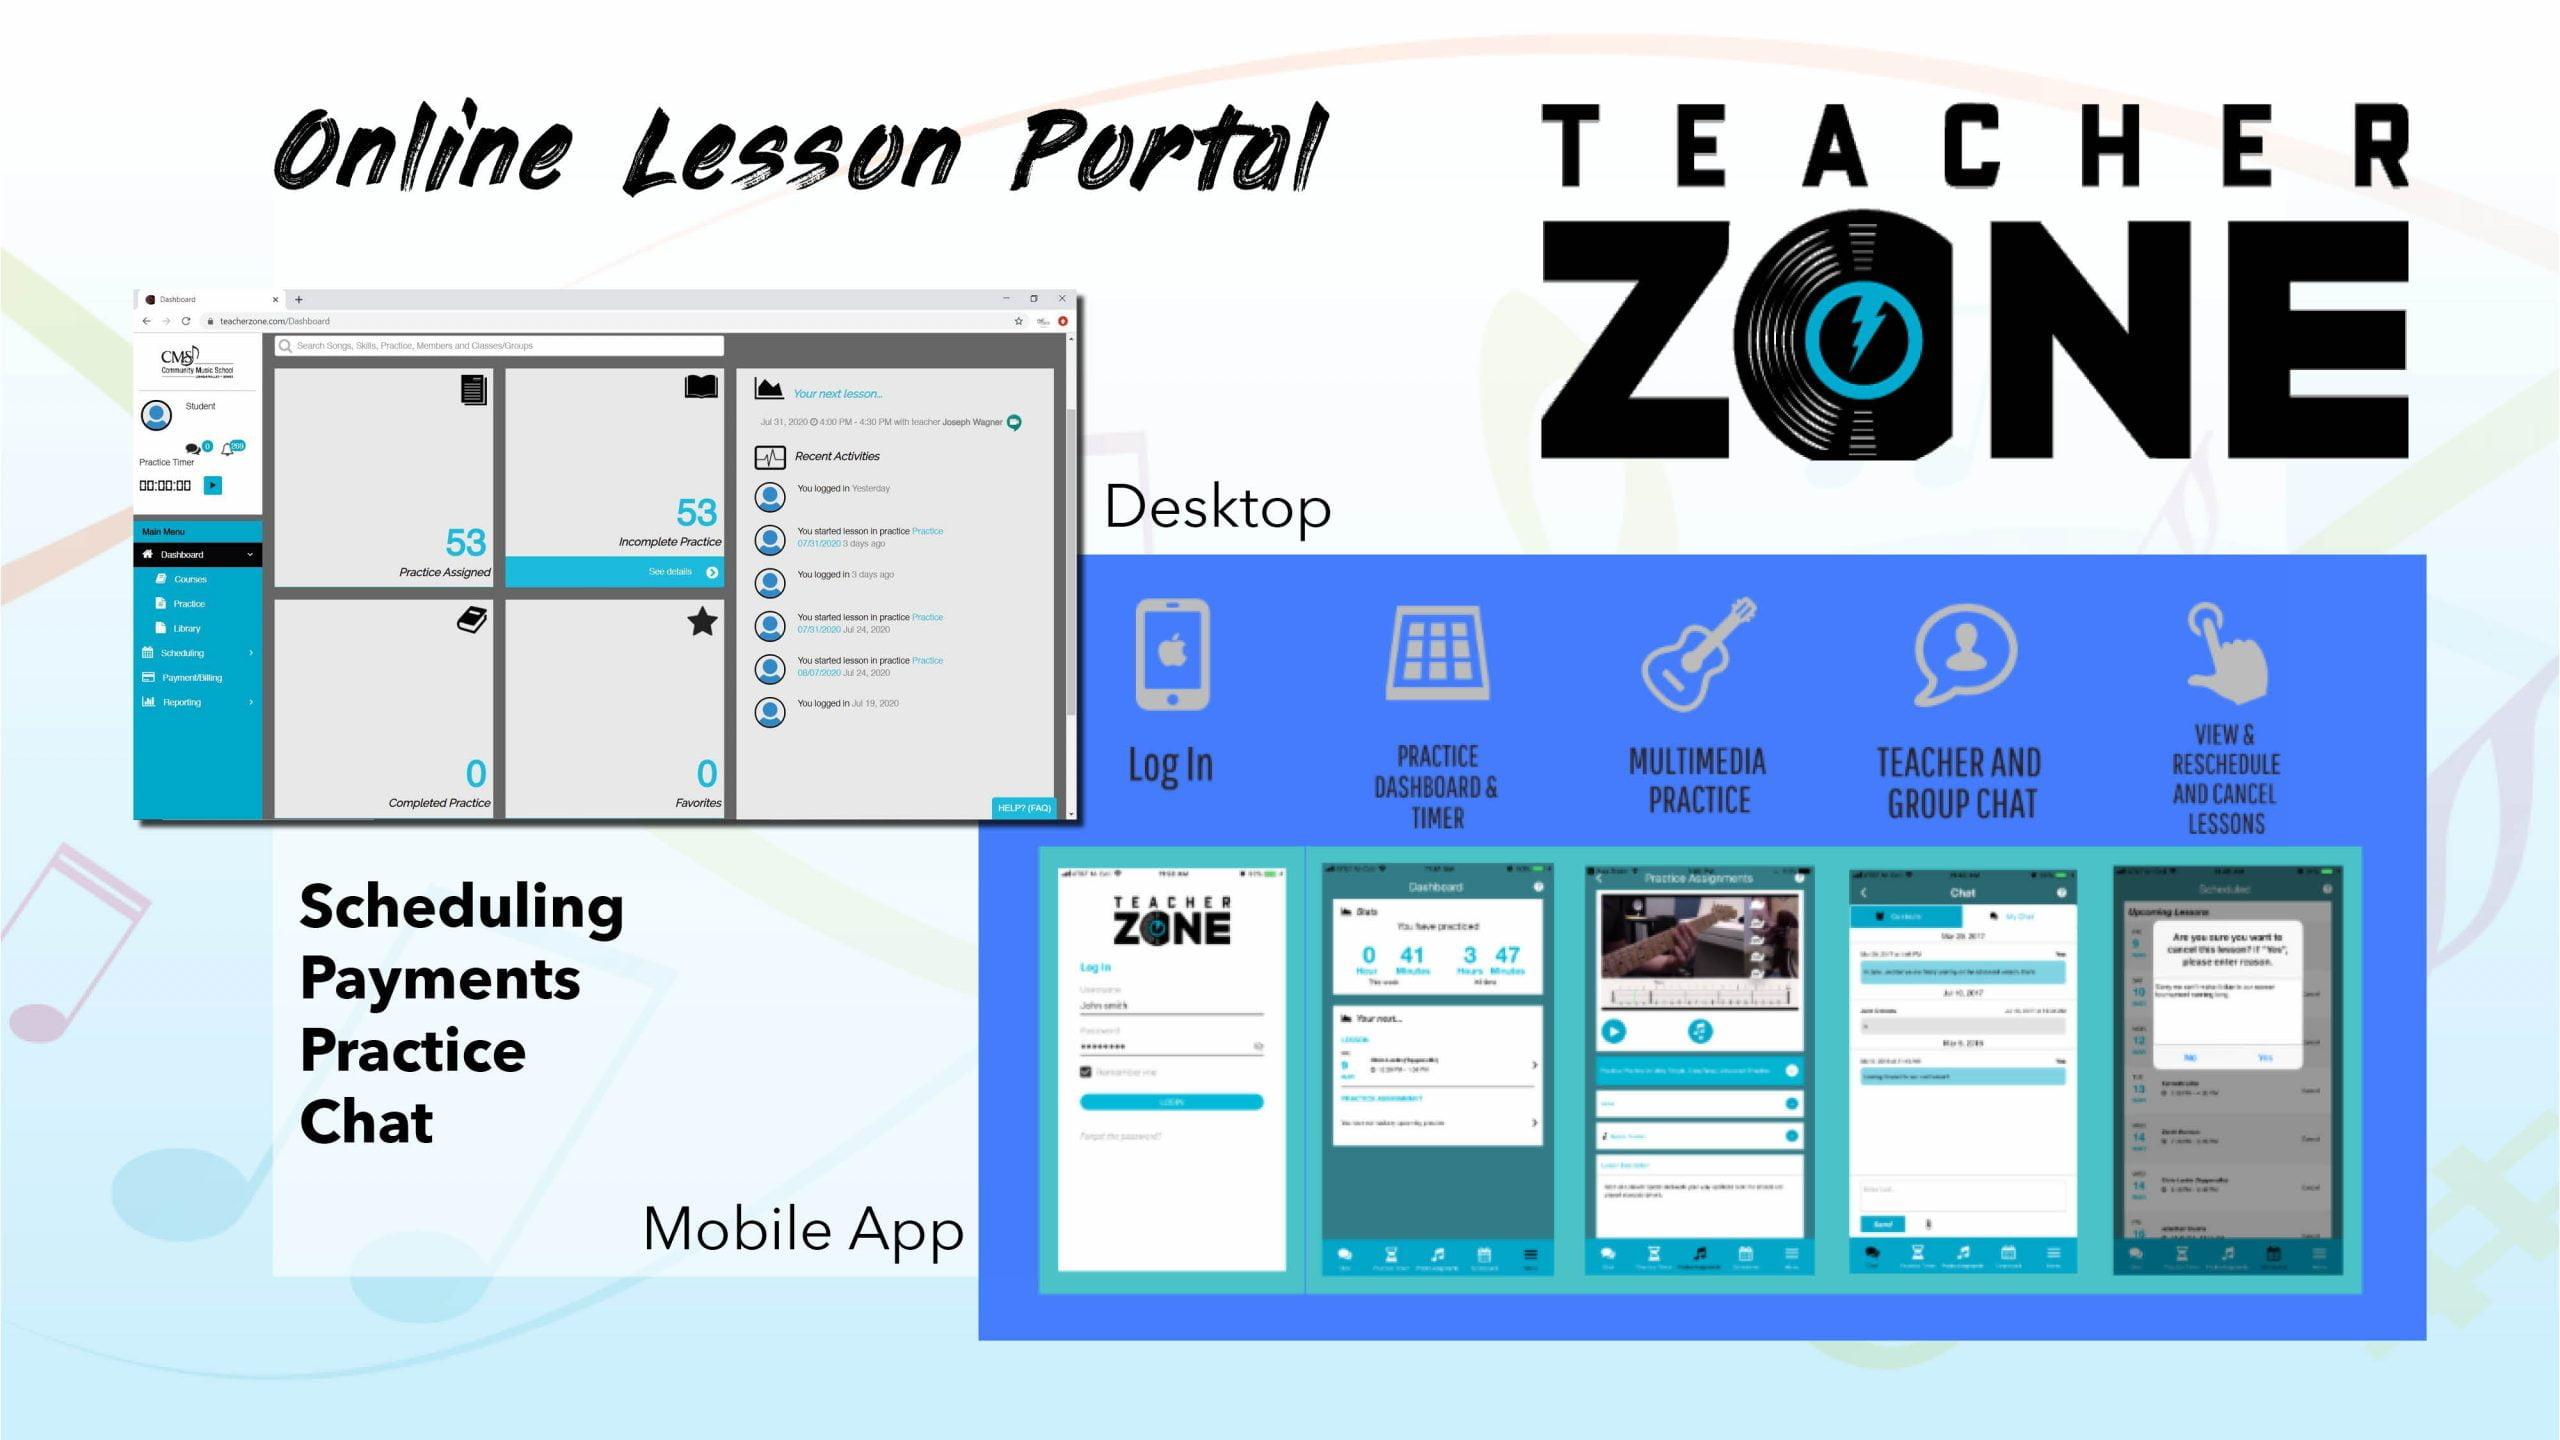 TeacherZone Community Music School lessons schedule app